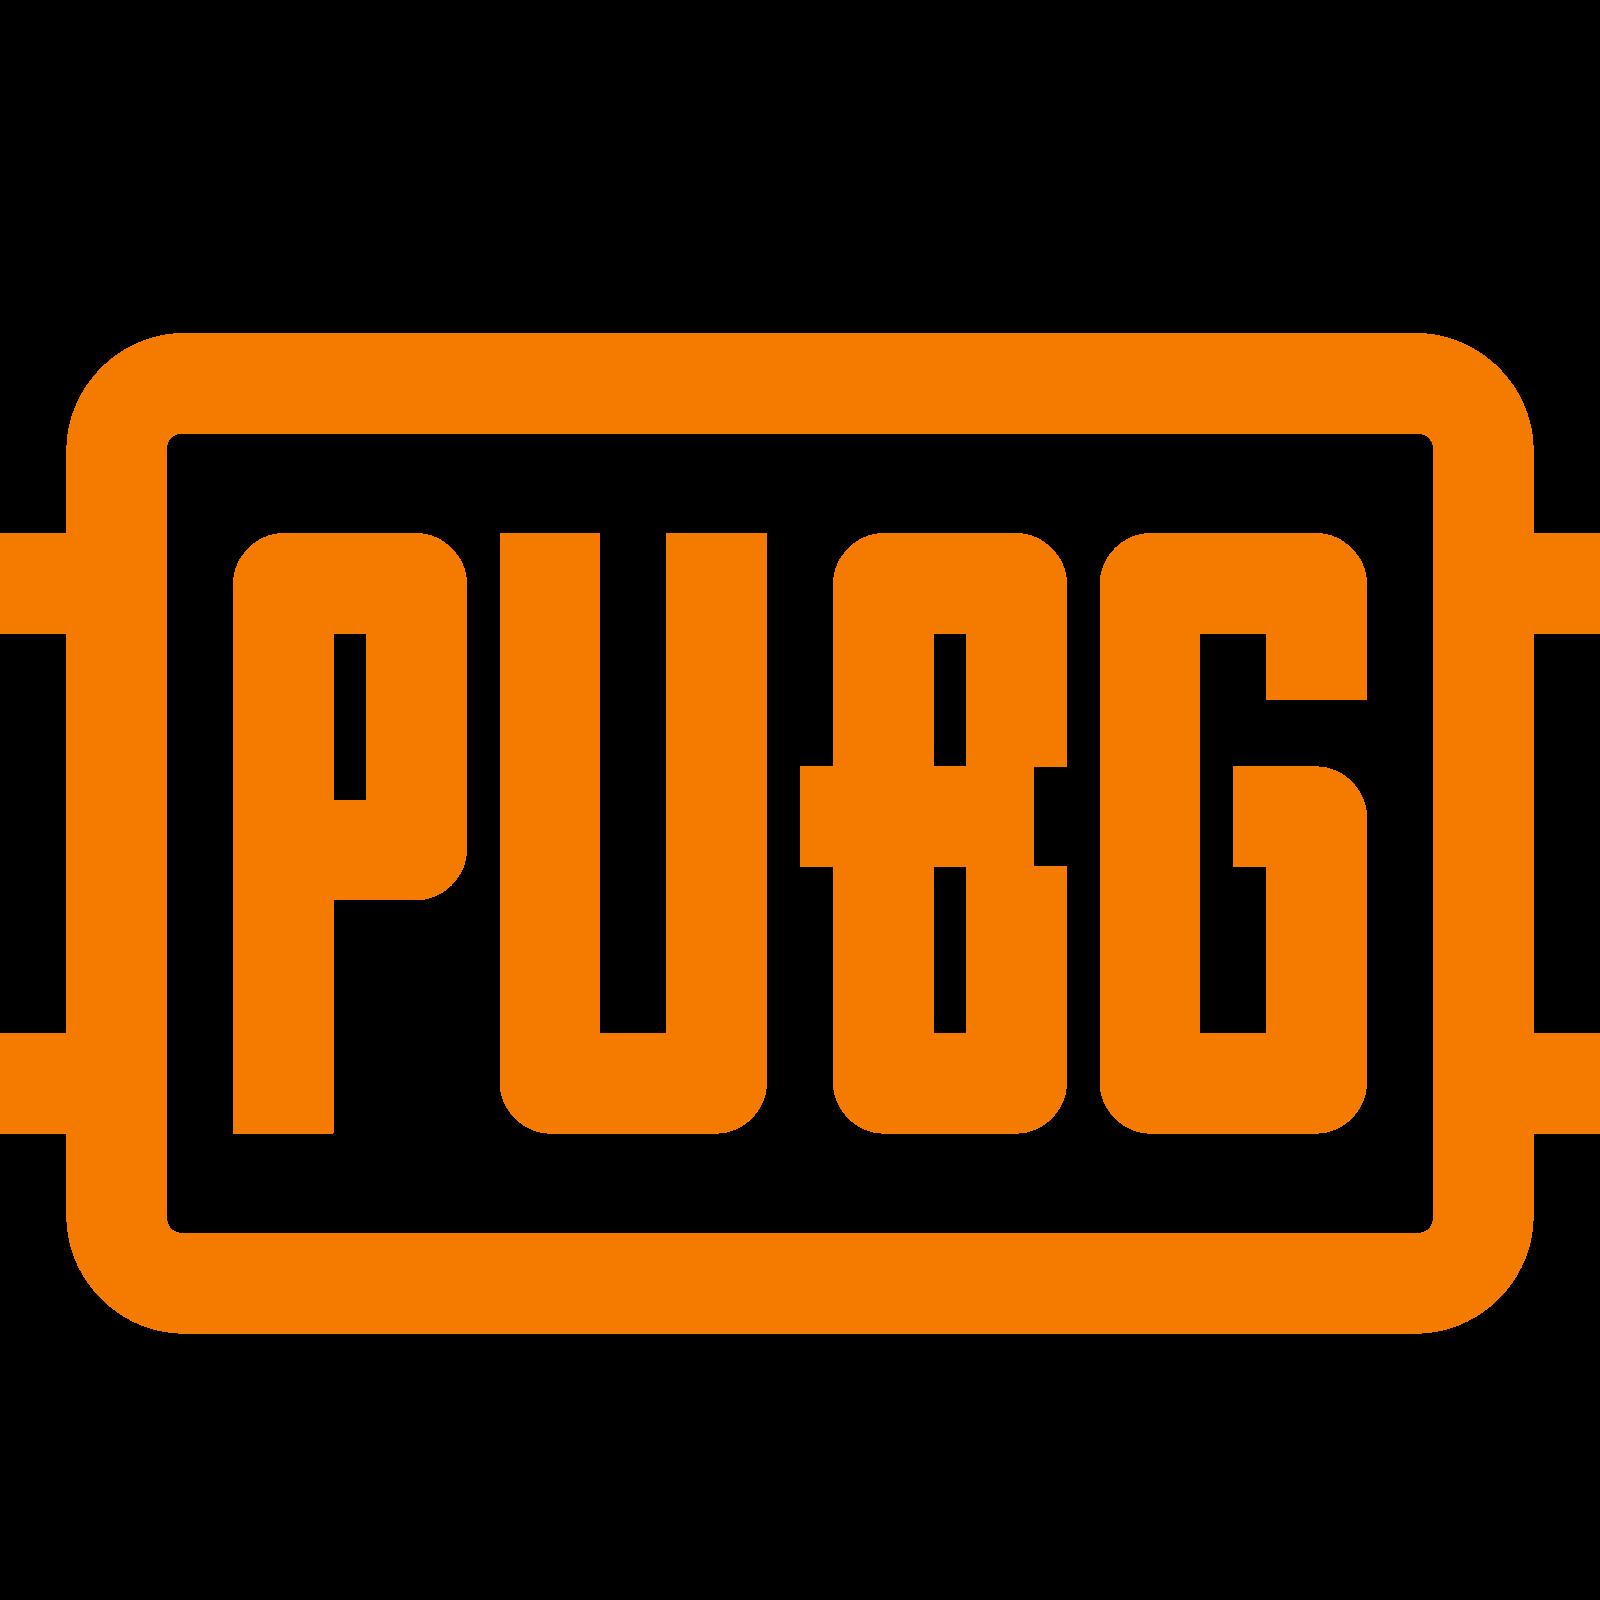 PUBG логотип PNG